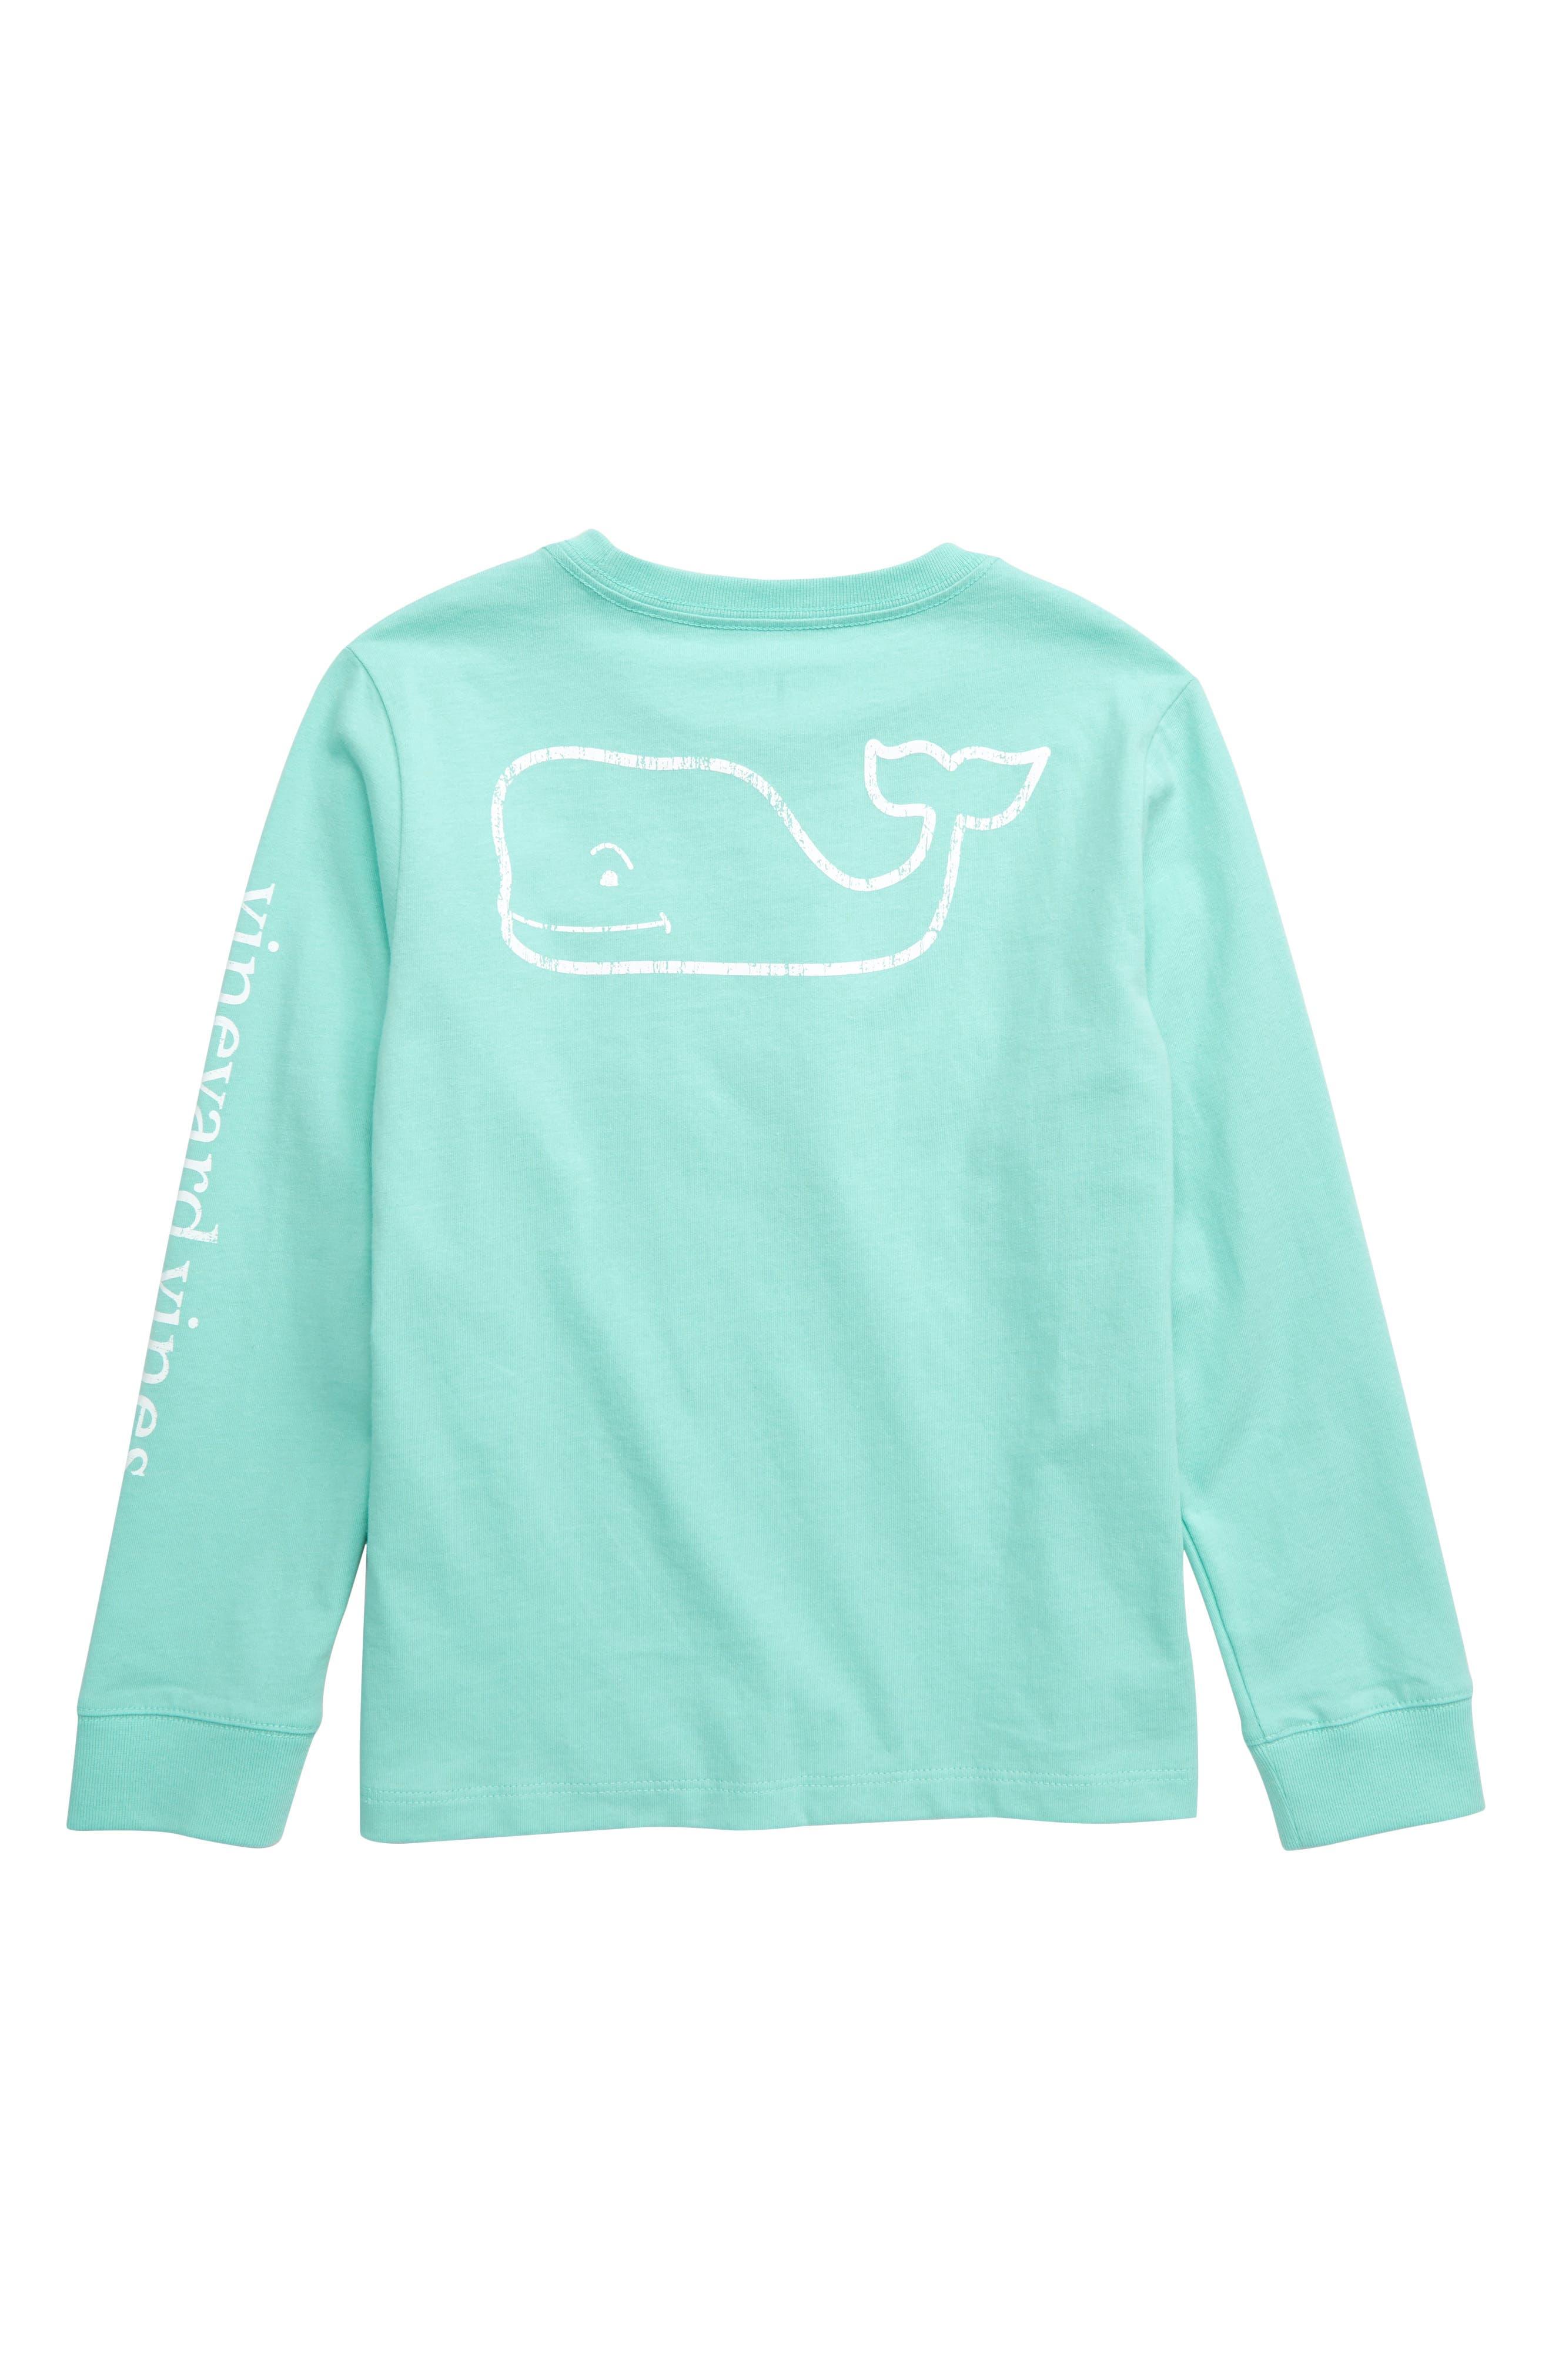 VINEYARD VINES,                             Vintage Whale Graphic Long Sleeve T-Shirt,                             Alternate thumbnail 2, color,                             405